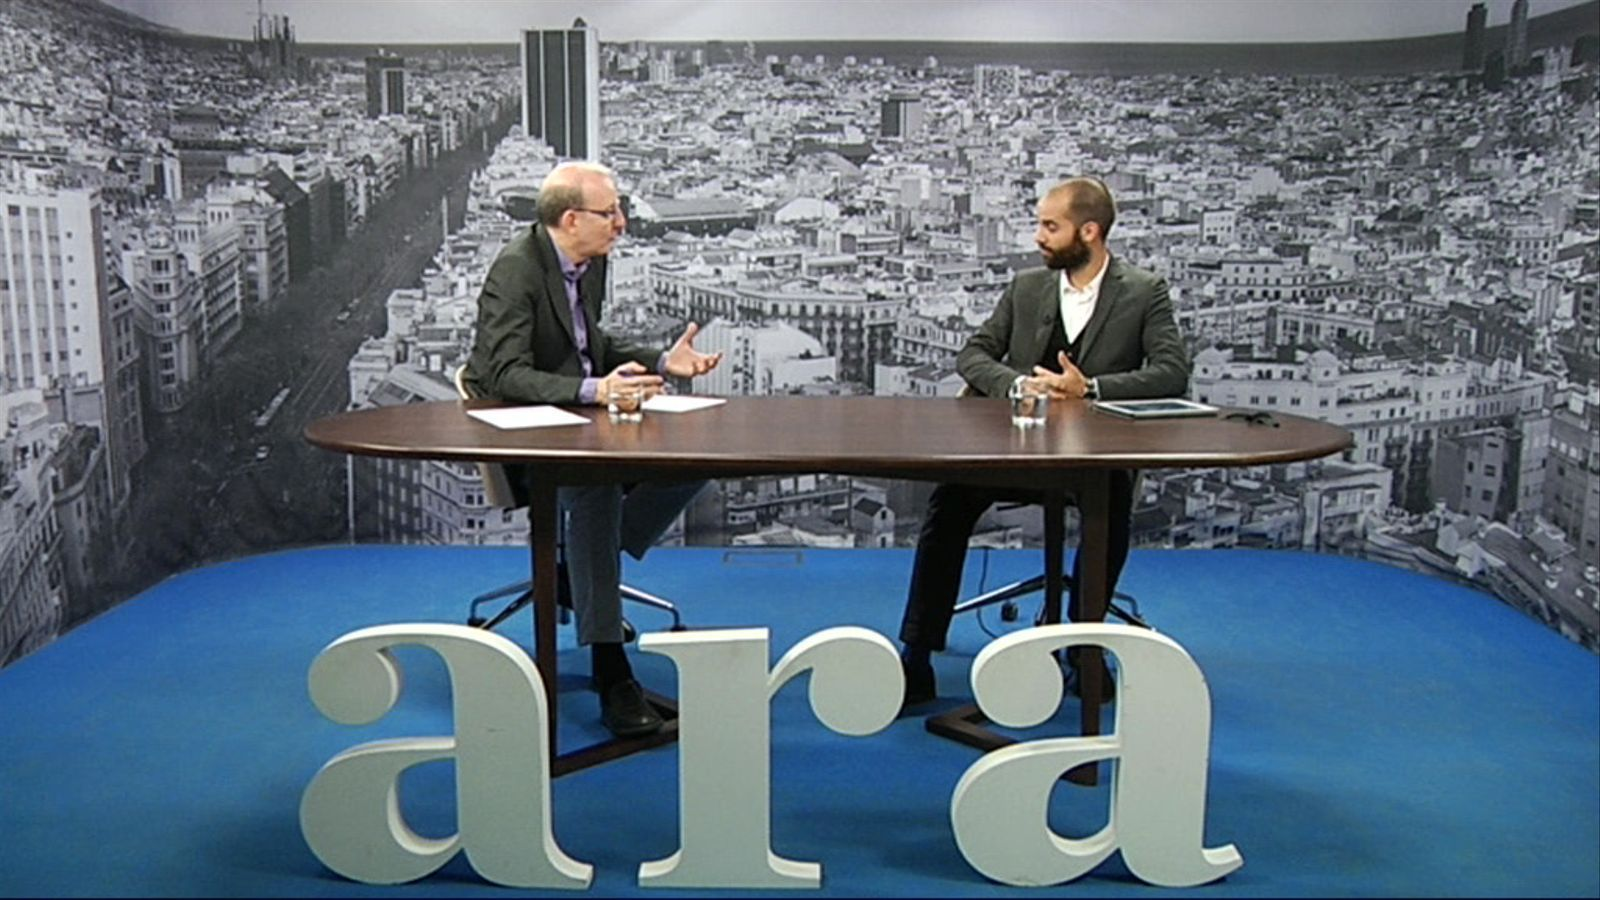 Entrevista d'Antoni Bassas a Raimon Puigjaner